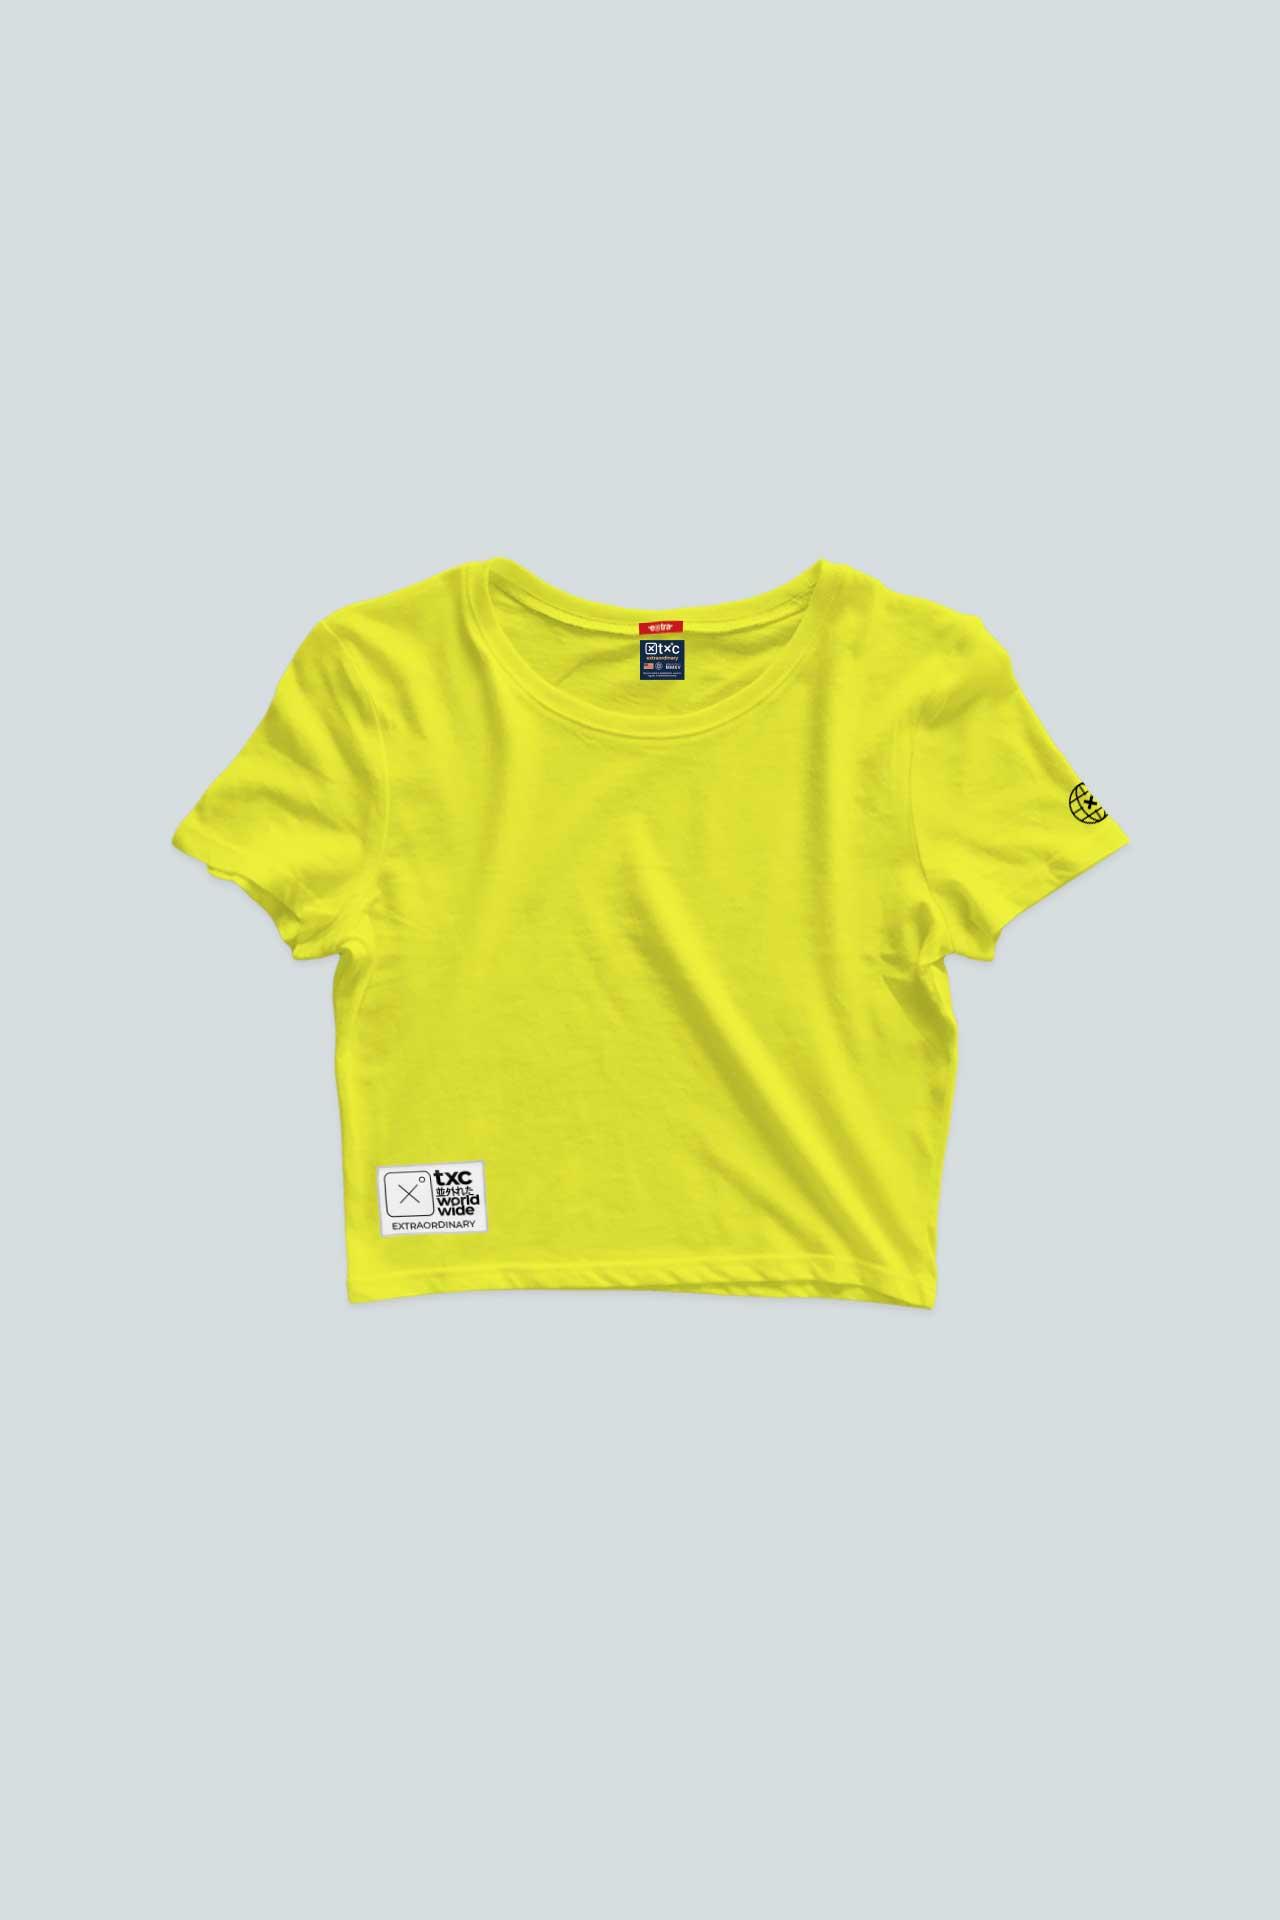 Cropped Feminino TXC 4951